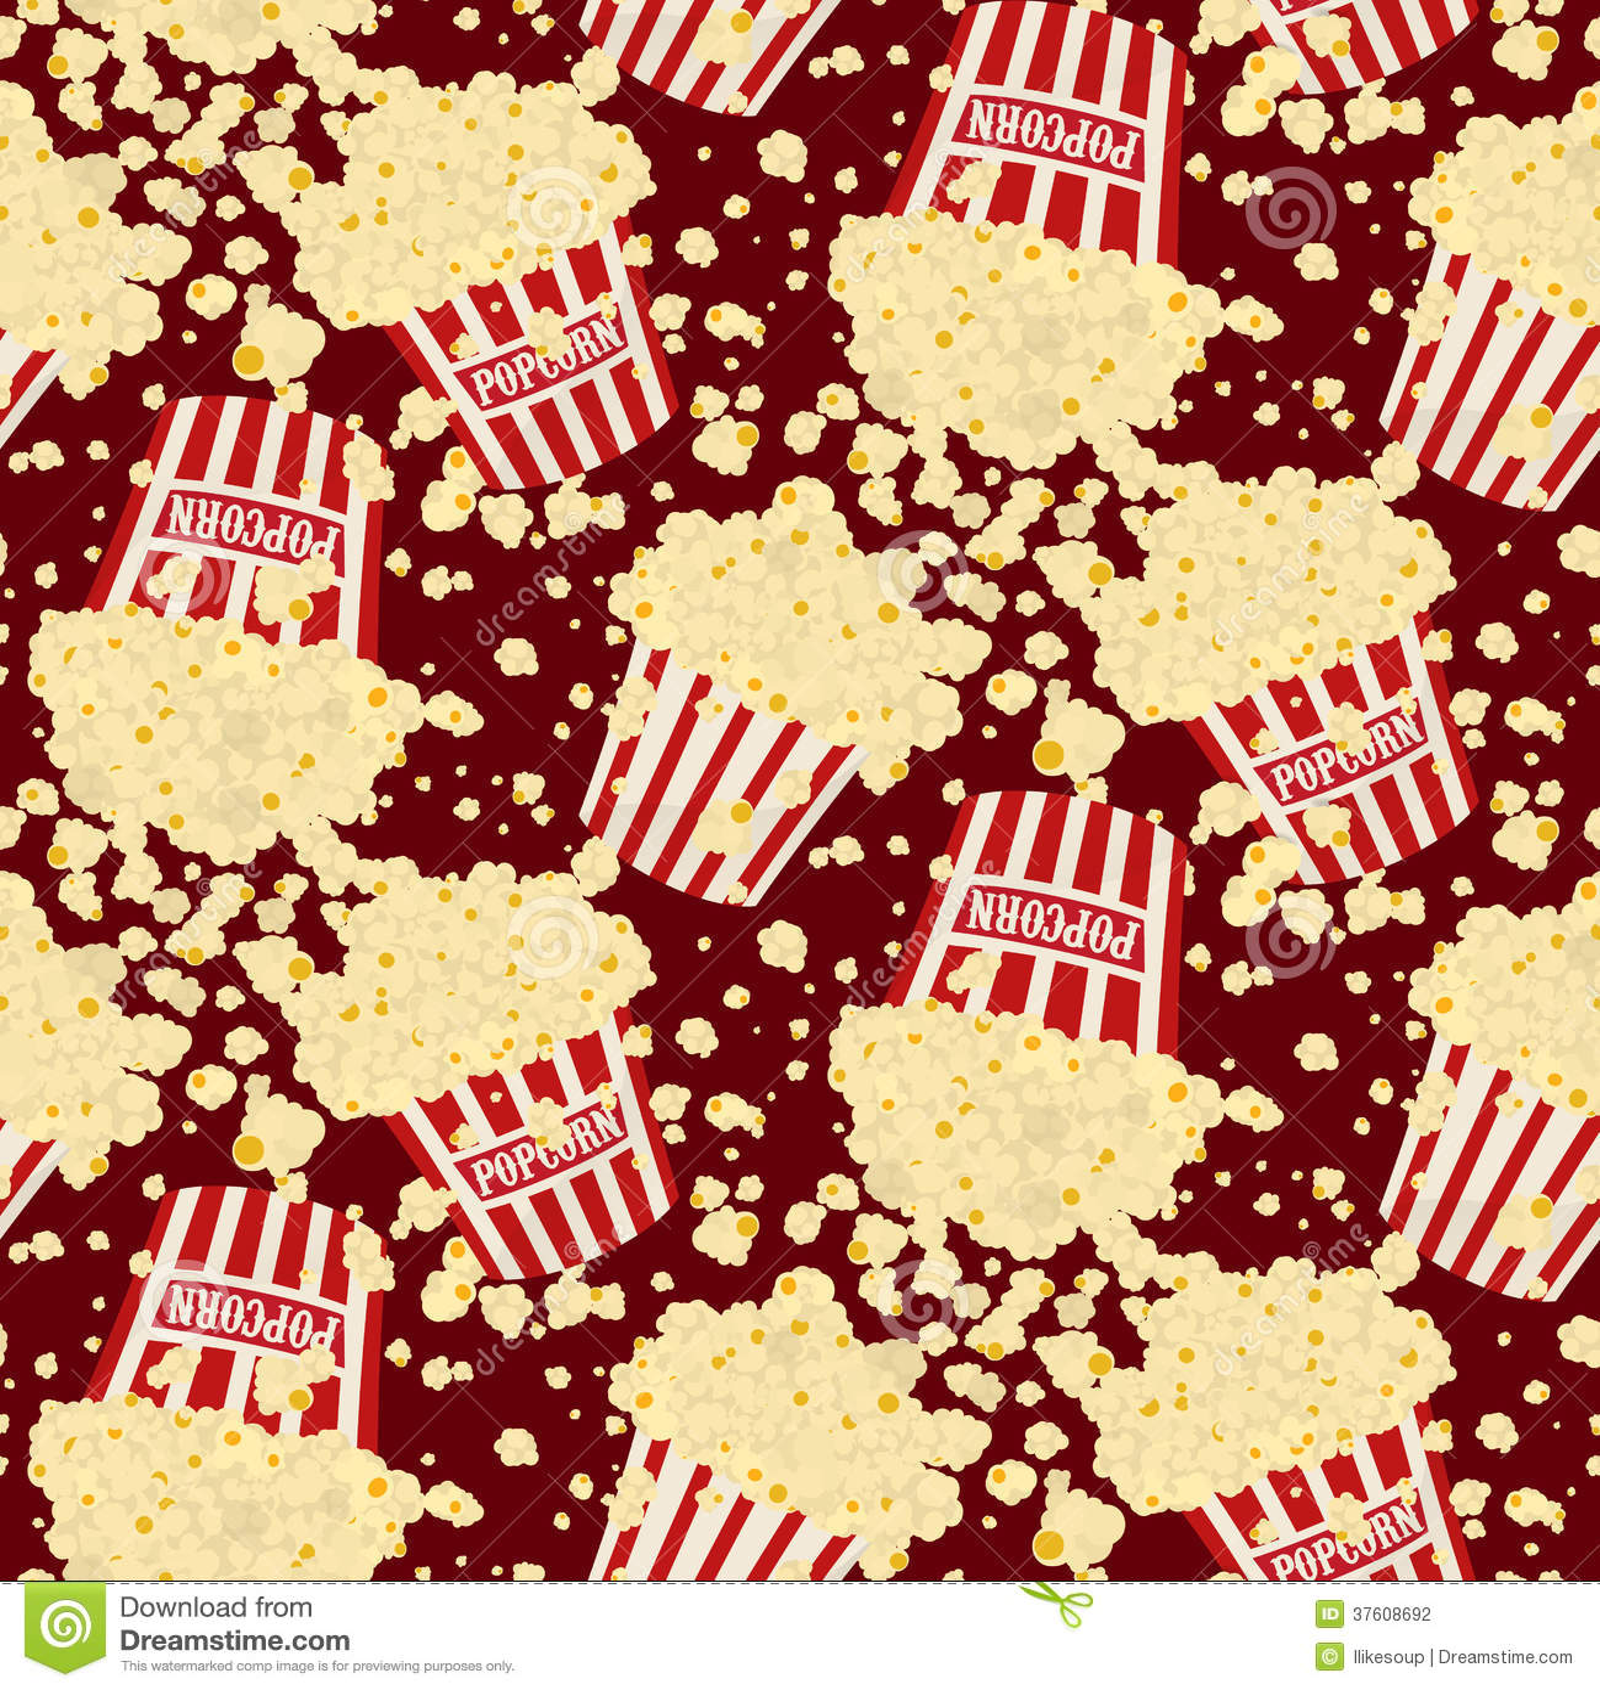 Popcorn Wallpaper: Seamless Vector Popcorn Background Stock Photography